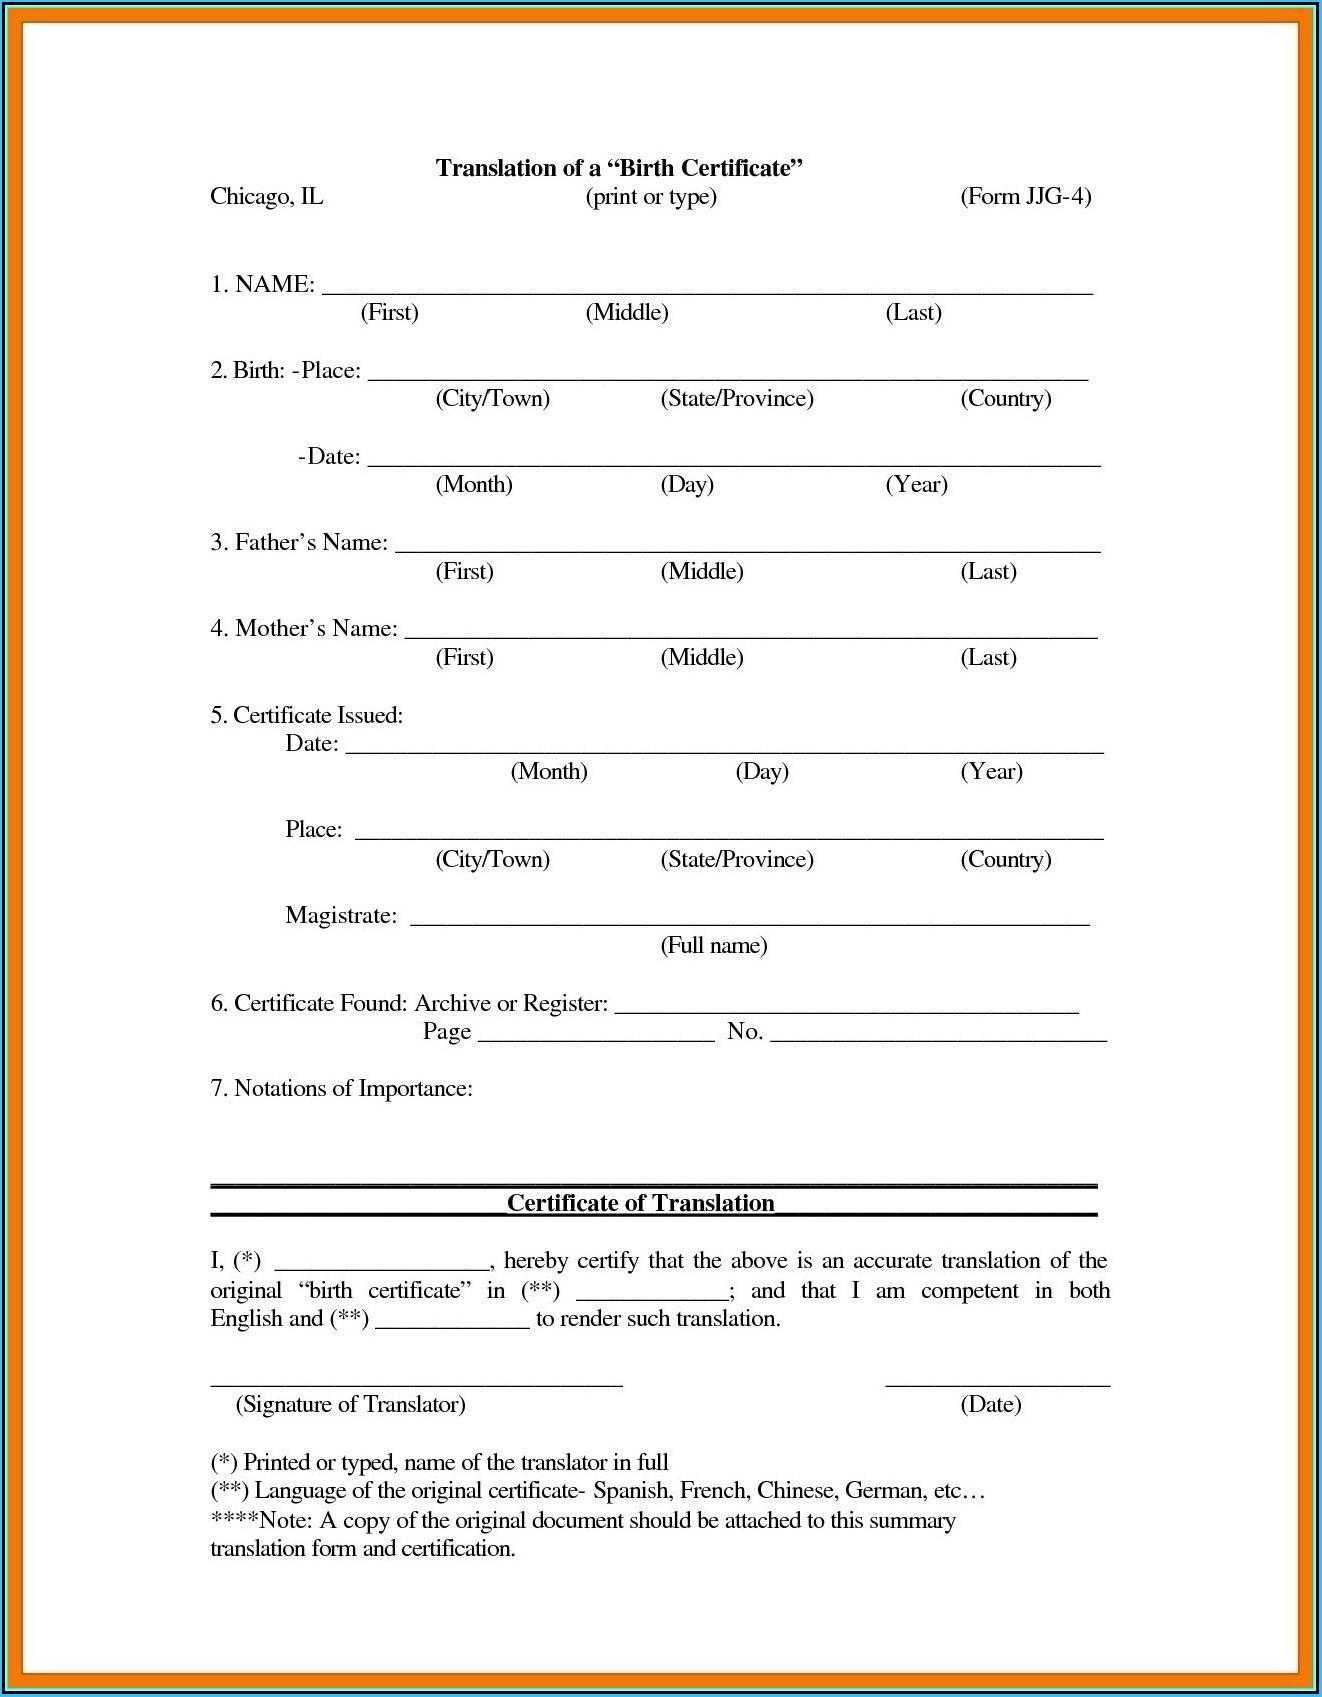 Uscis Birth Certificate Translation Template #10036 With Uscis Birth Certificate Translation Template